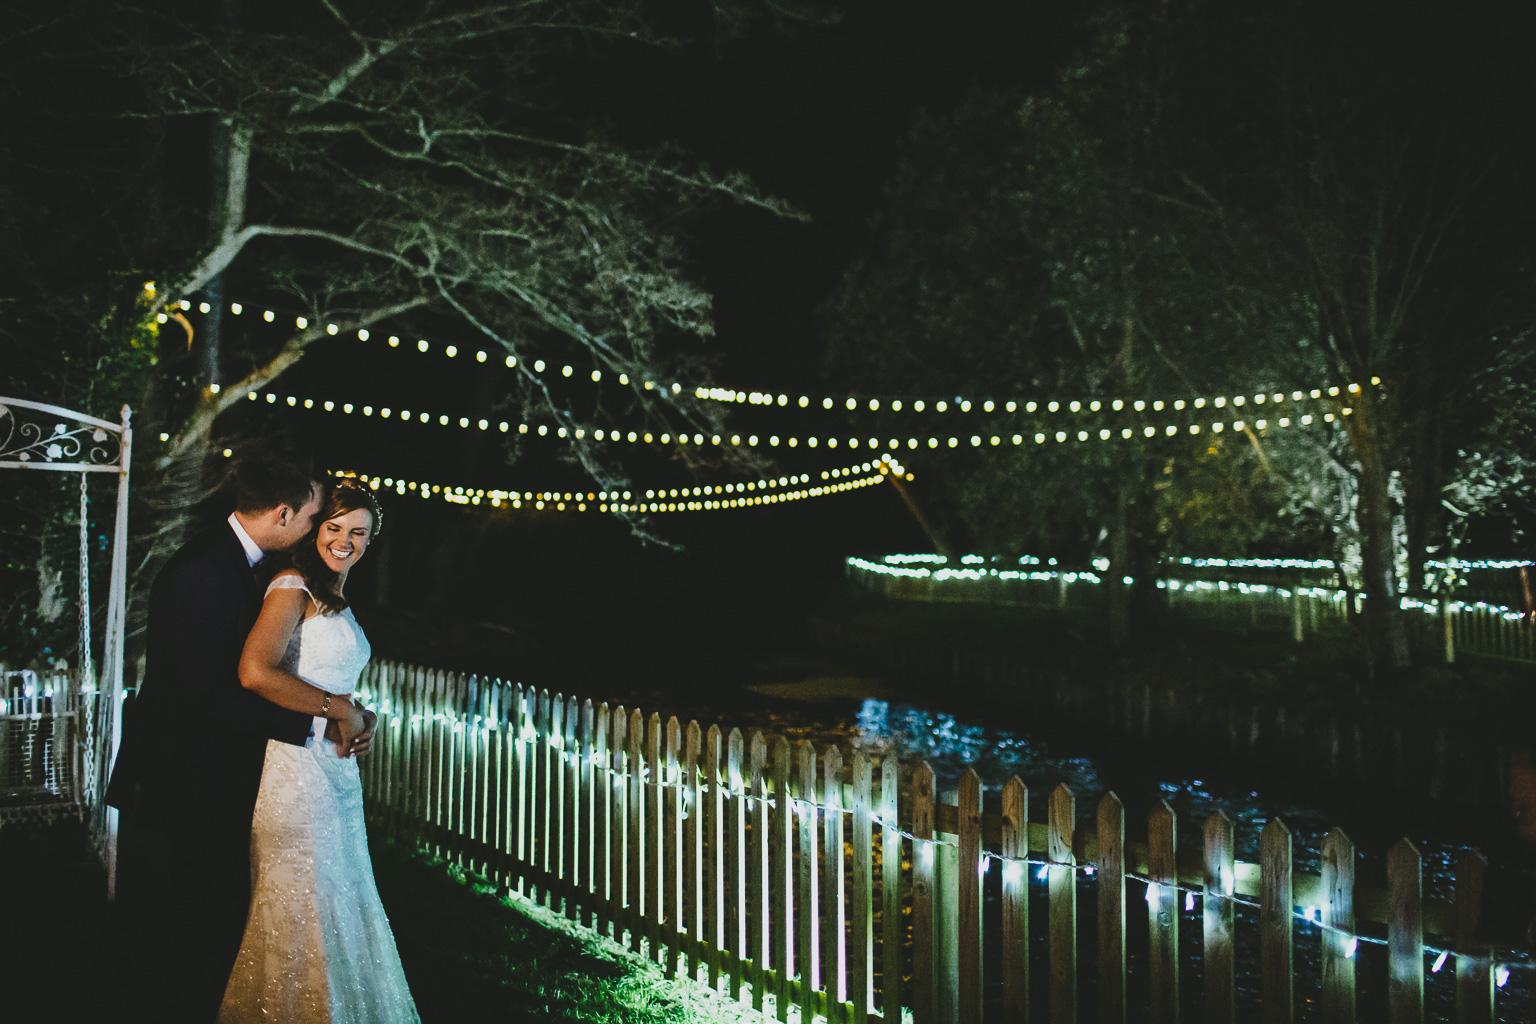 Creative-wedding-photography-00011